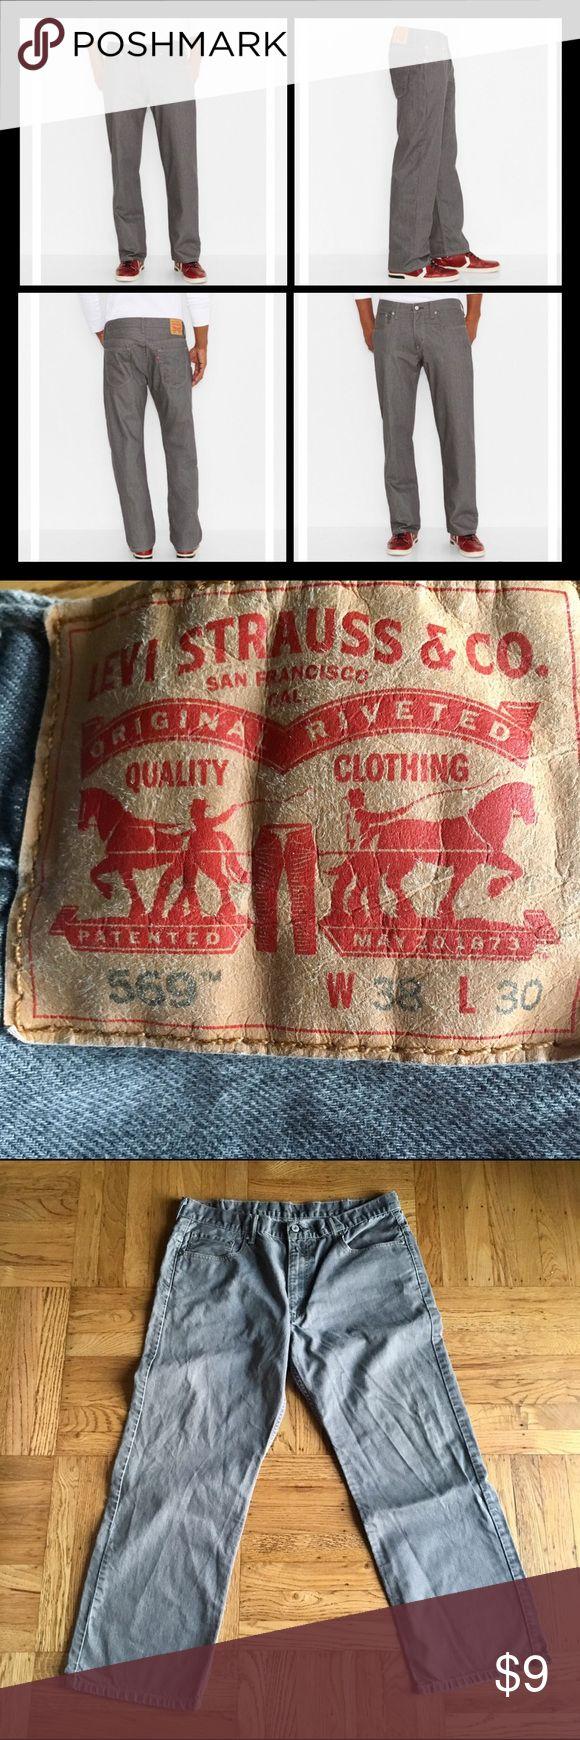 "Men   EUC Levi's 569 Loose Straight Jeans / 38x30 Men   EUC Levi 569 'Loose Straight' fit grey colored jeans in a size 38"" waist and 30"" length. Levi's Jeans Straight"